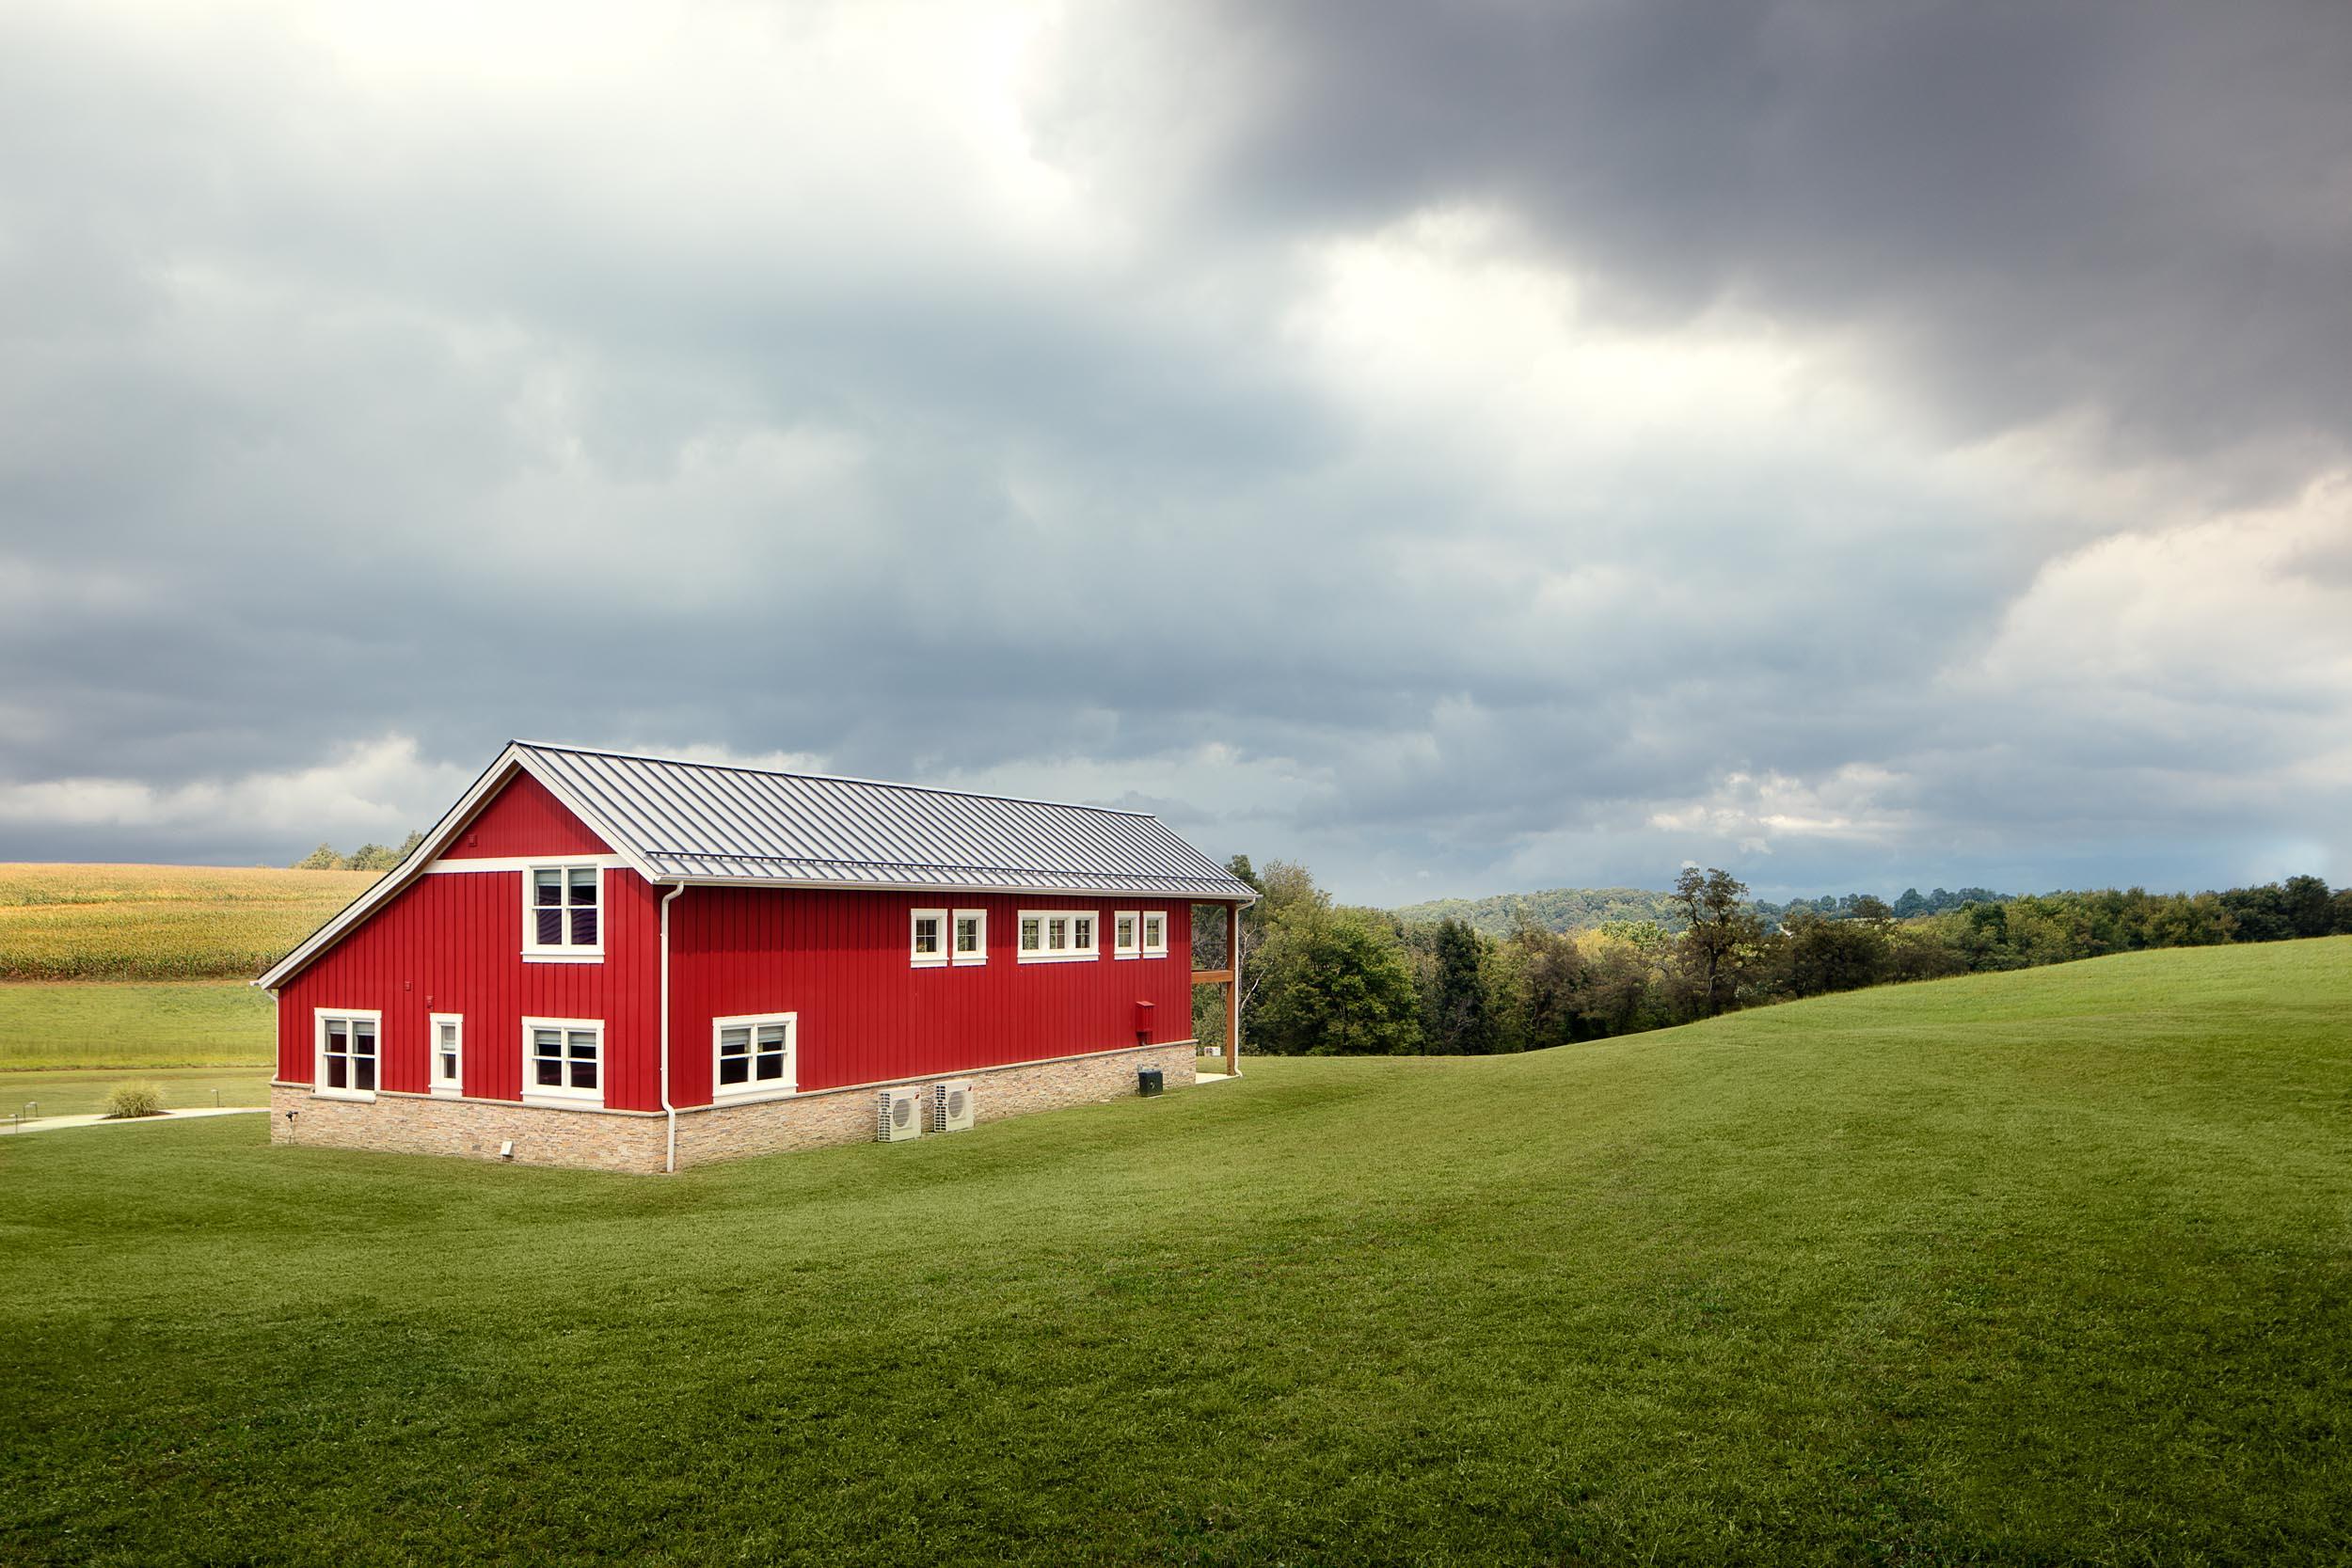 home_barn_upscale_country_grealish-12.jpg